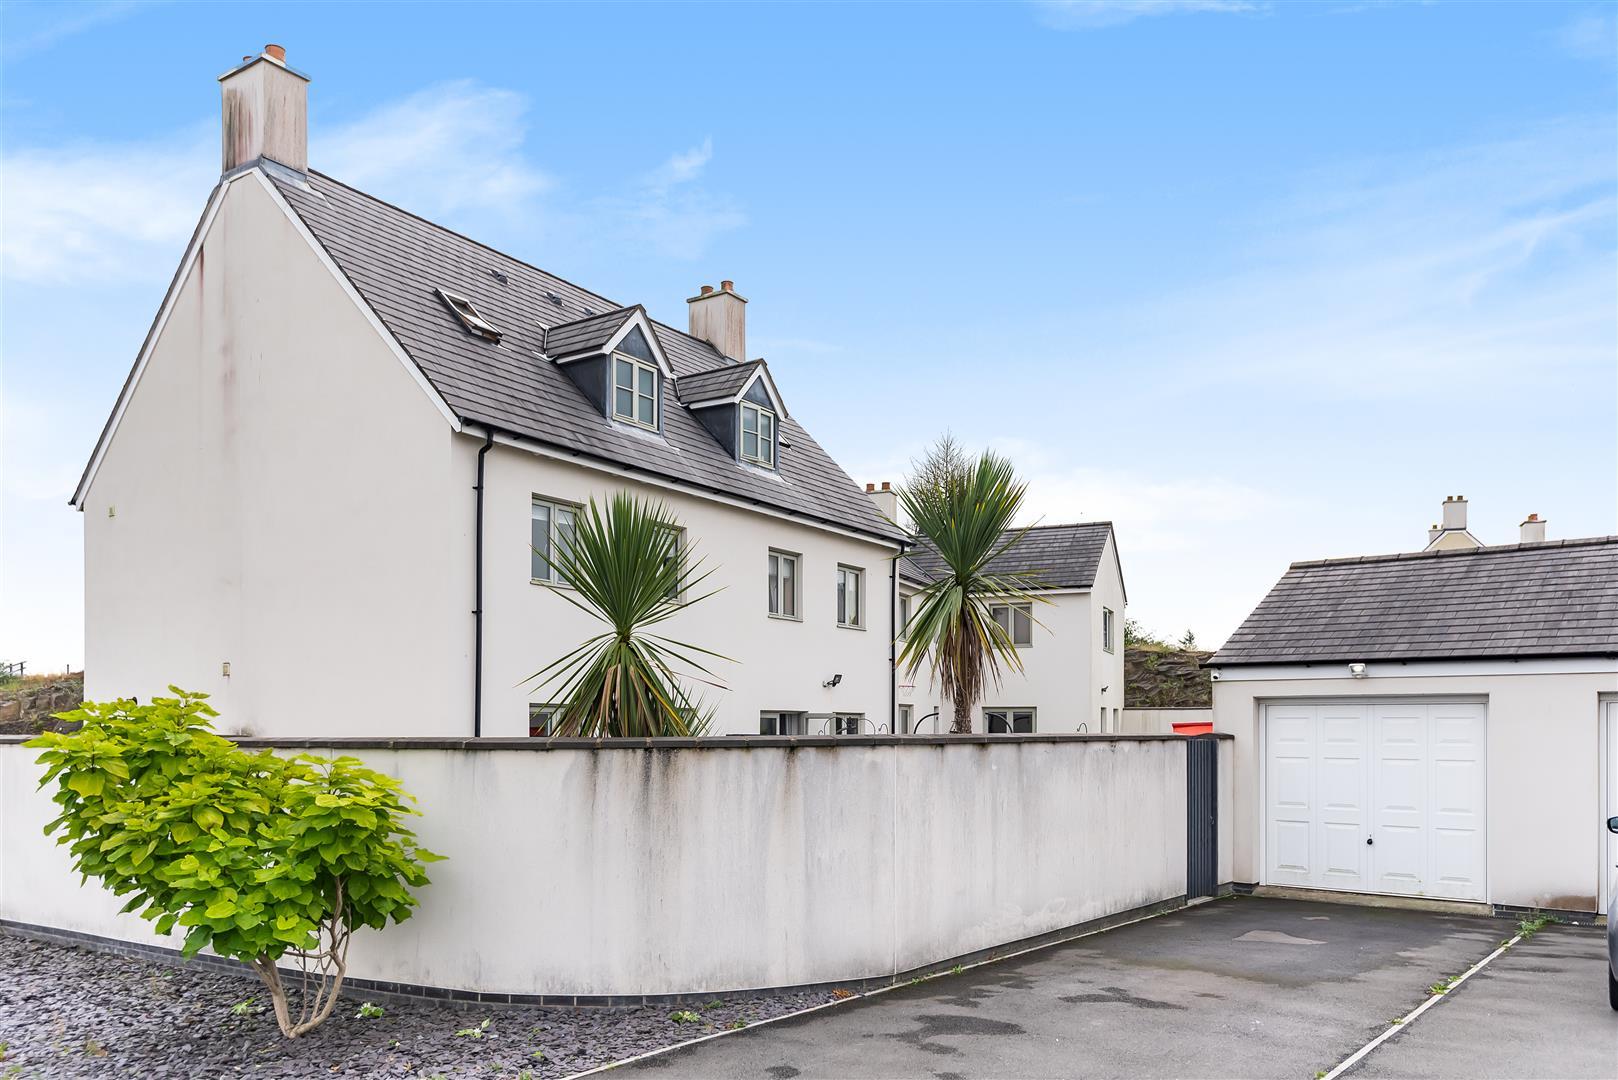 Ridgeway Lane, Llandarcy, Neath, SA10 6FY